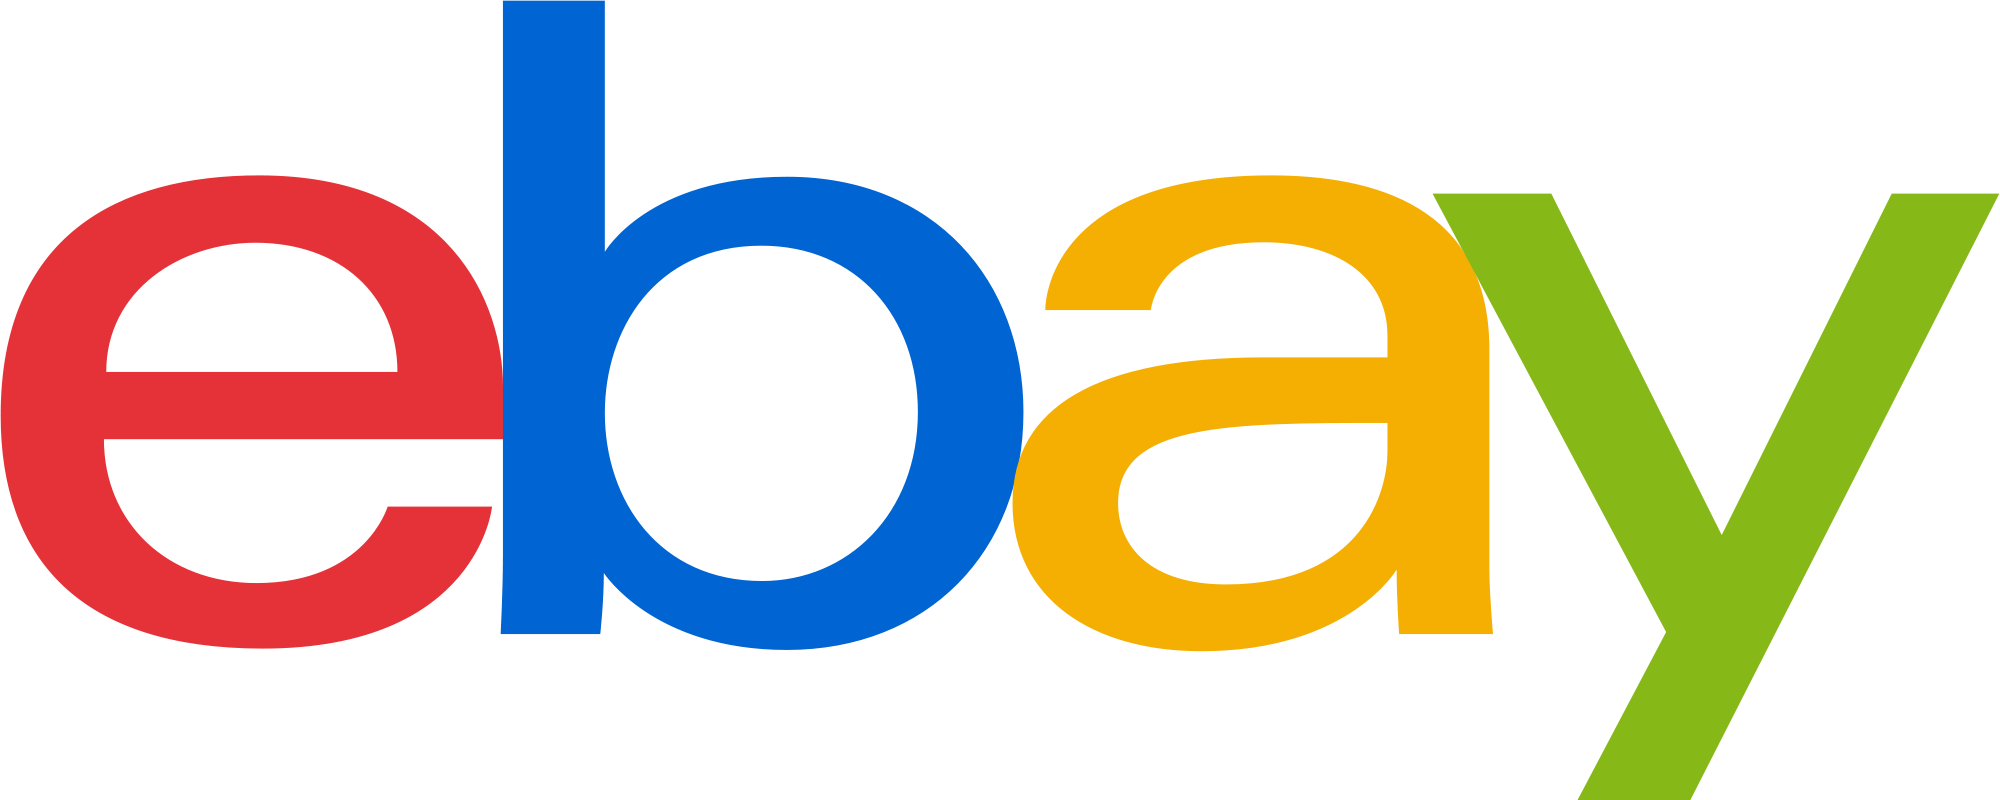 Start a profitable eBay business